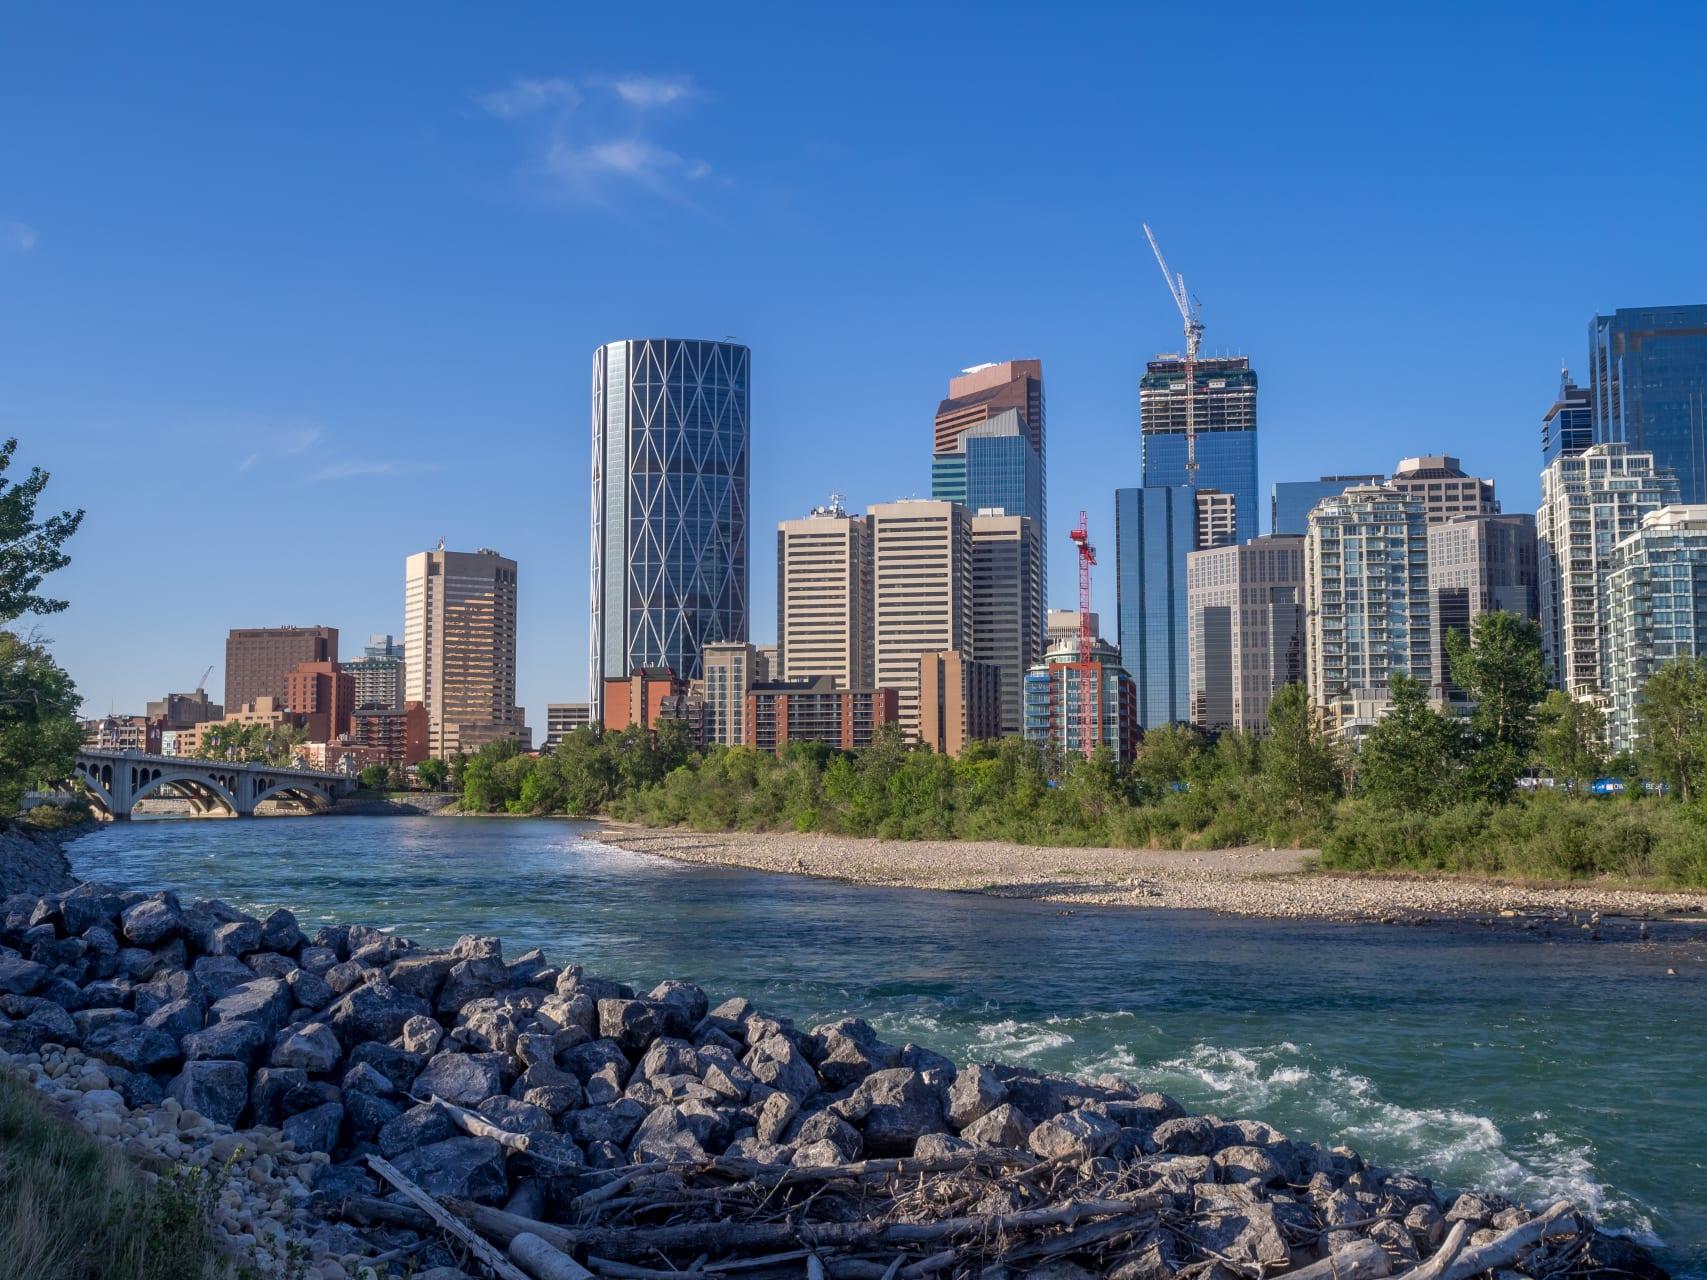 Calgary - Calgary: A walk along the Bow River